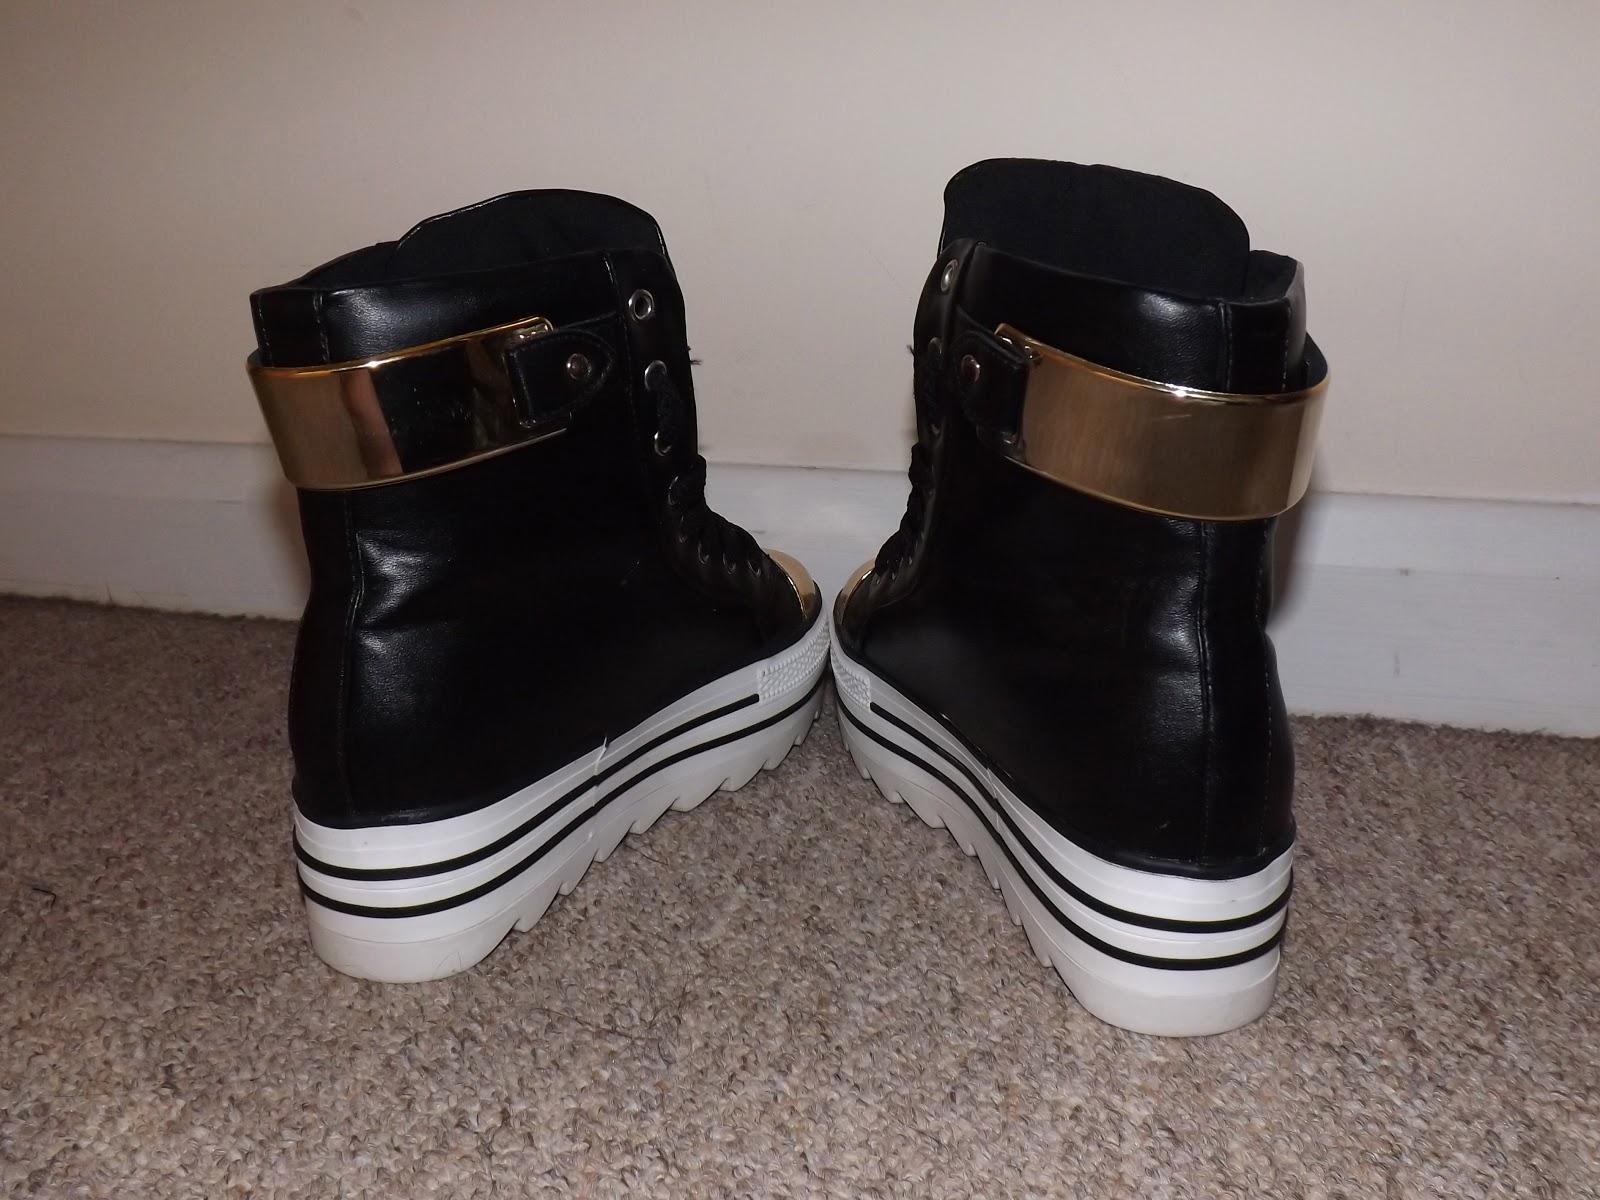 Shoes Barratts Sale